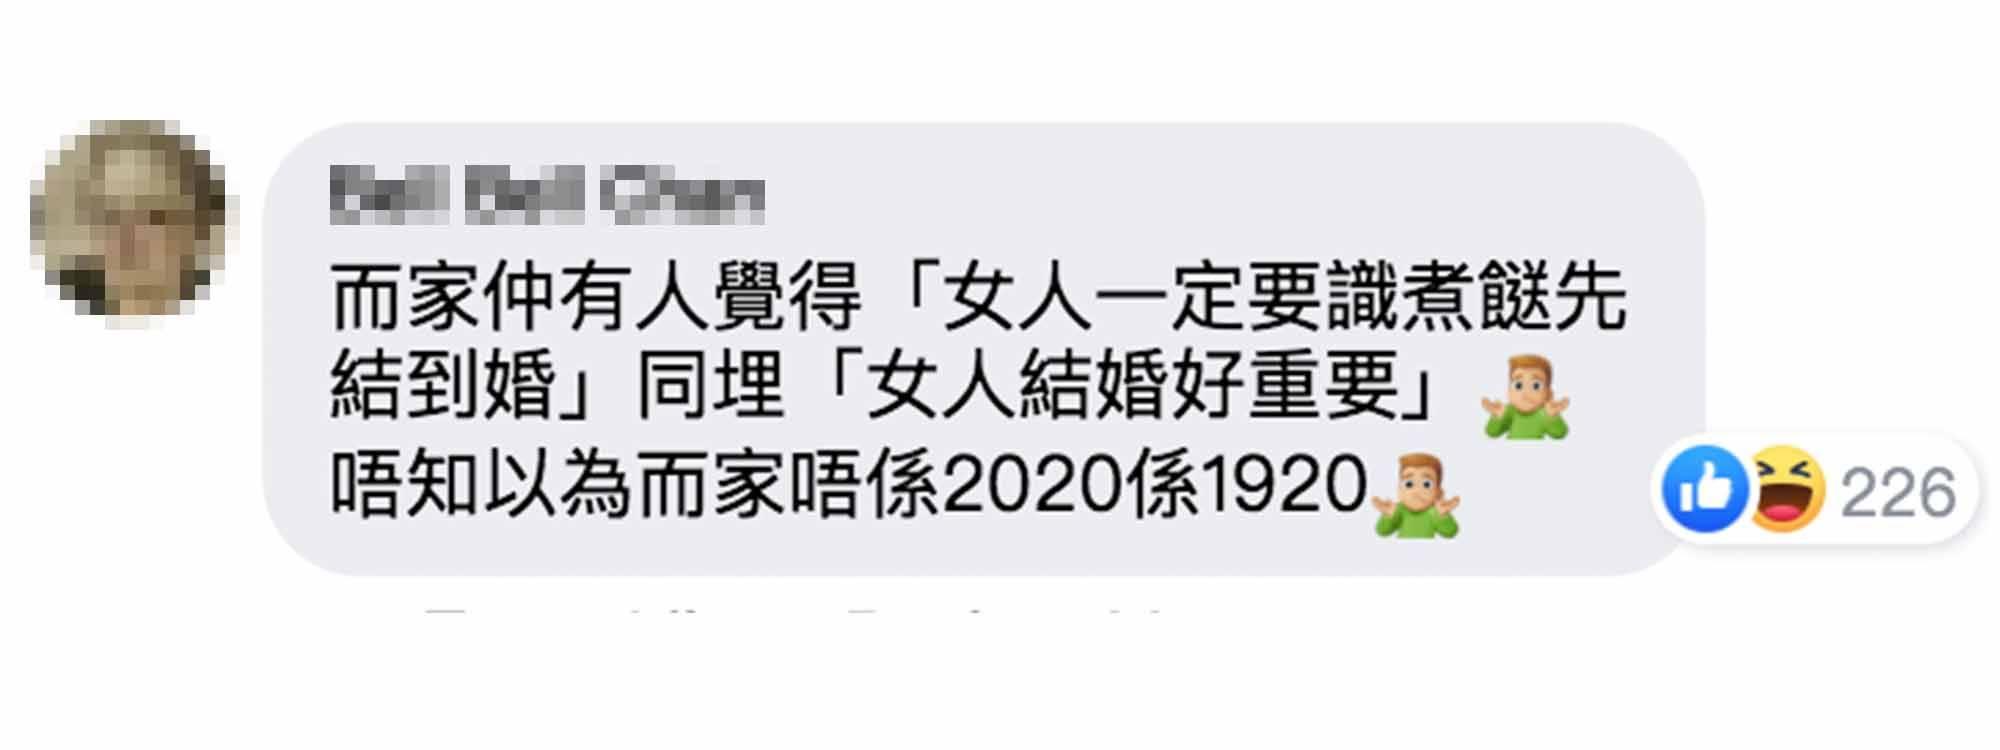 TVB《女人必學 100 道菜》江美儀+三姐惹爭議 5大負評 被網民鬧爆:海南雞生都照食 網絡熱話